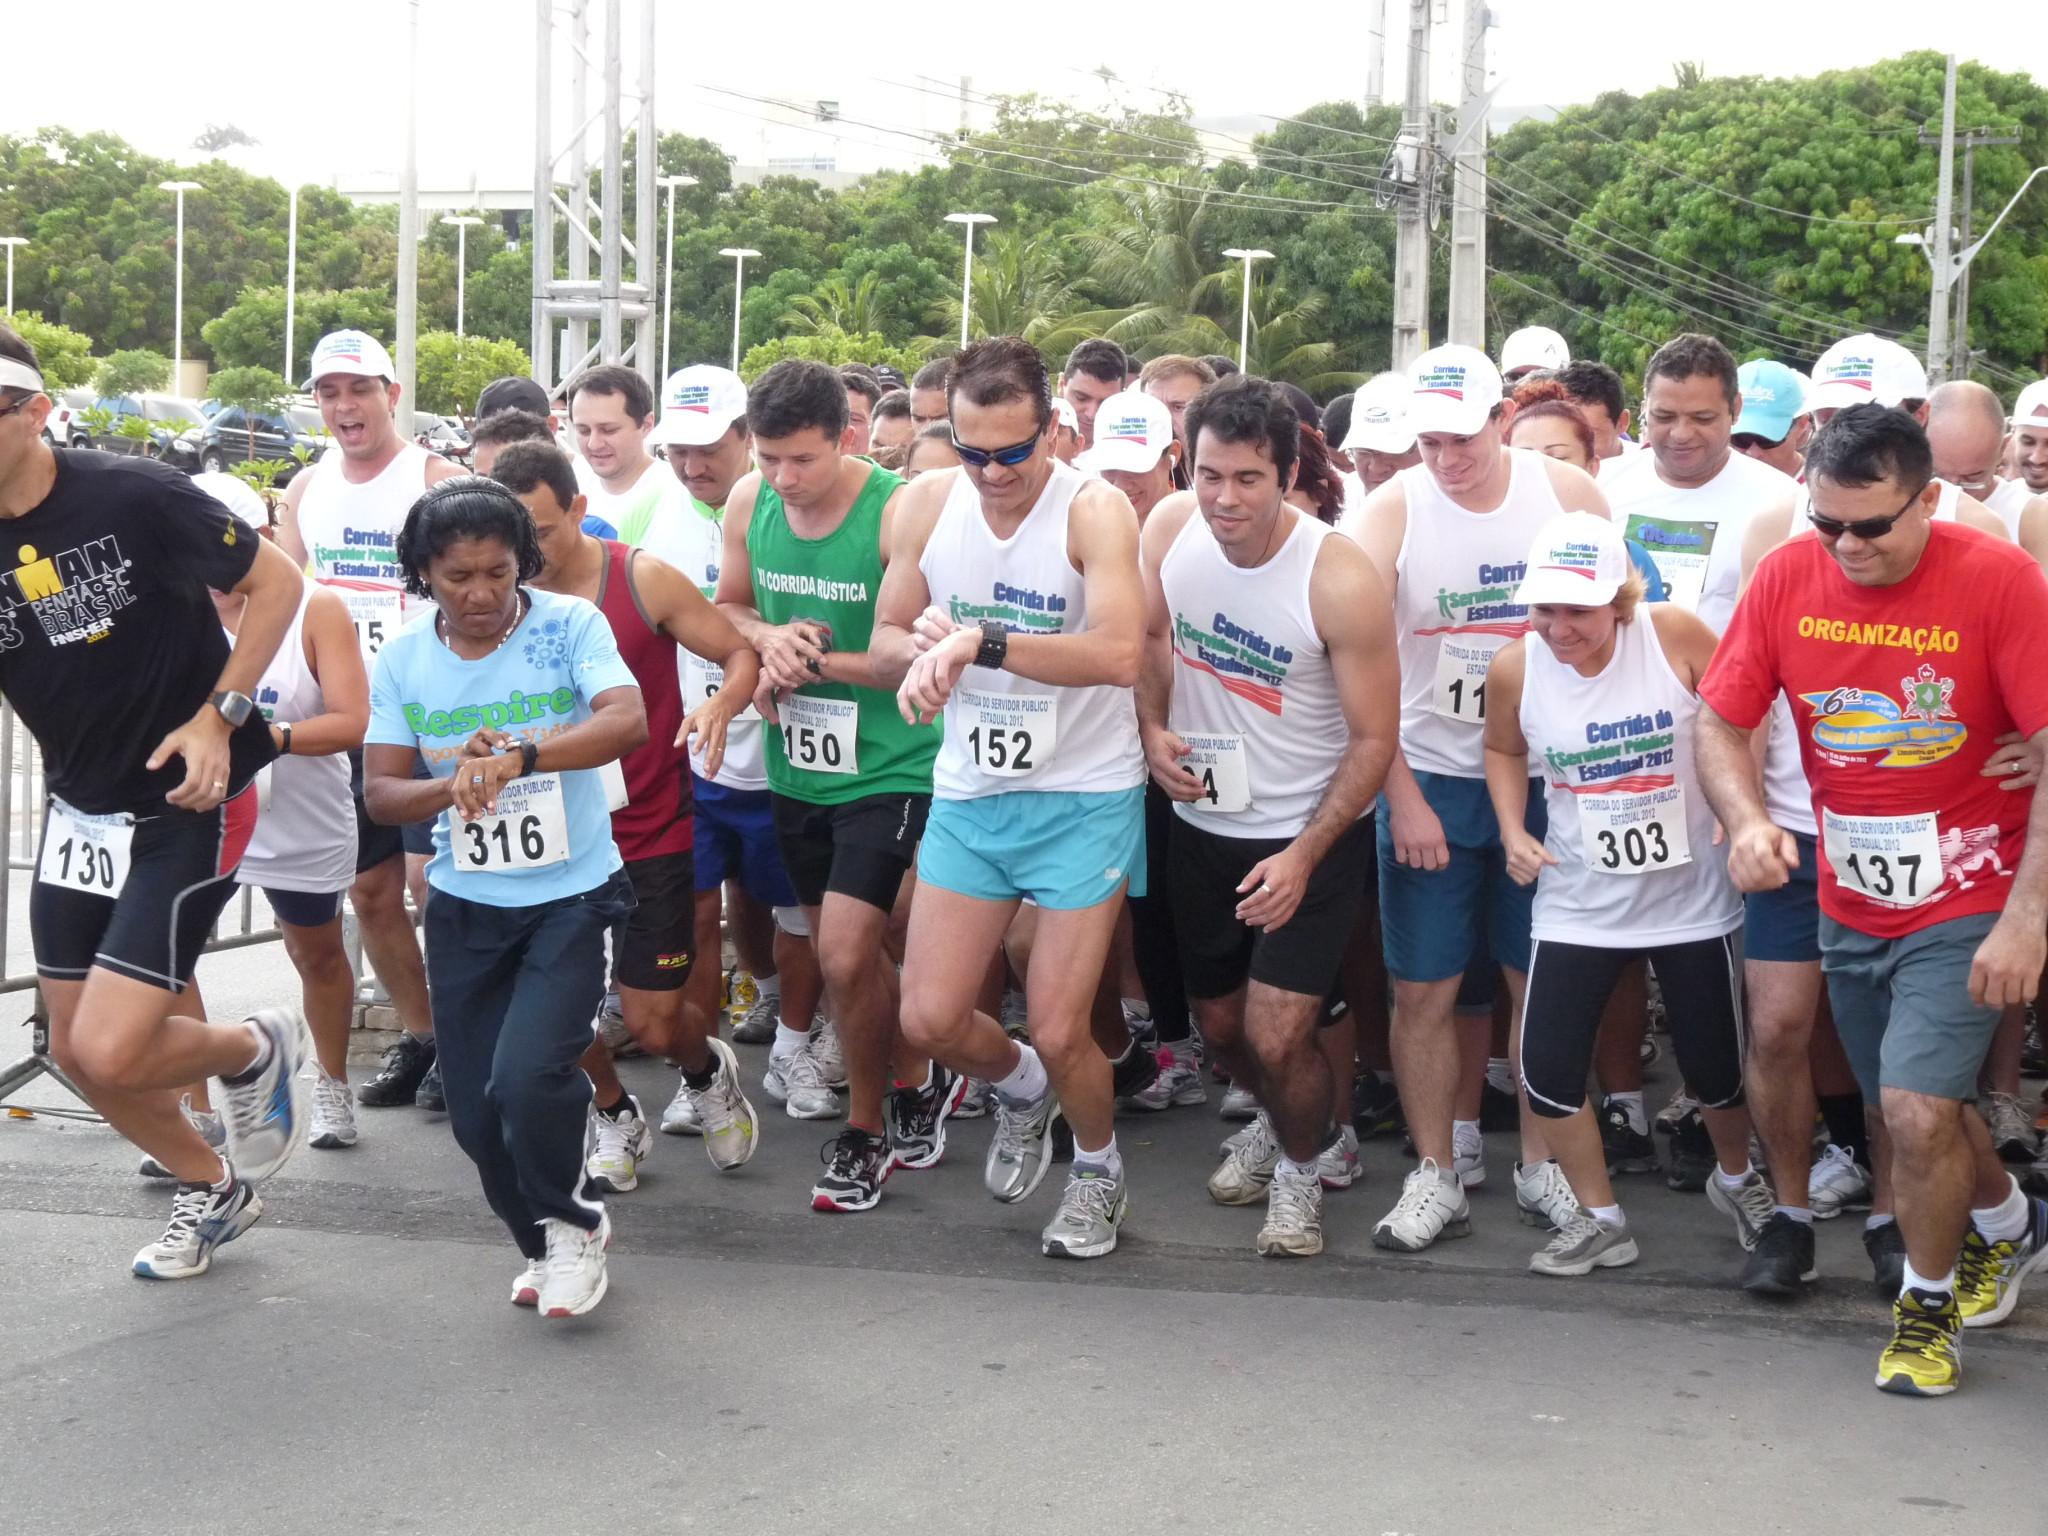 Corrida do Servidor Público reúne 240 atletas